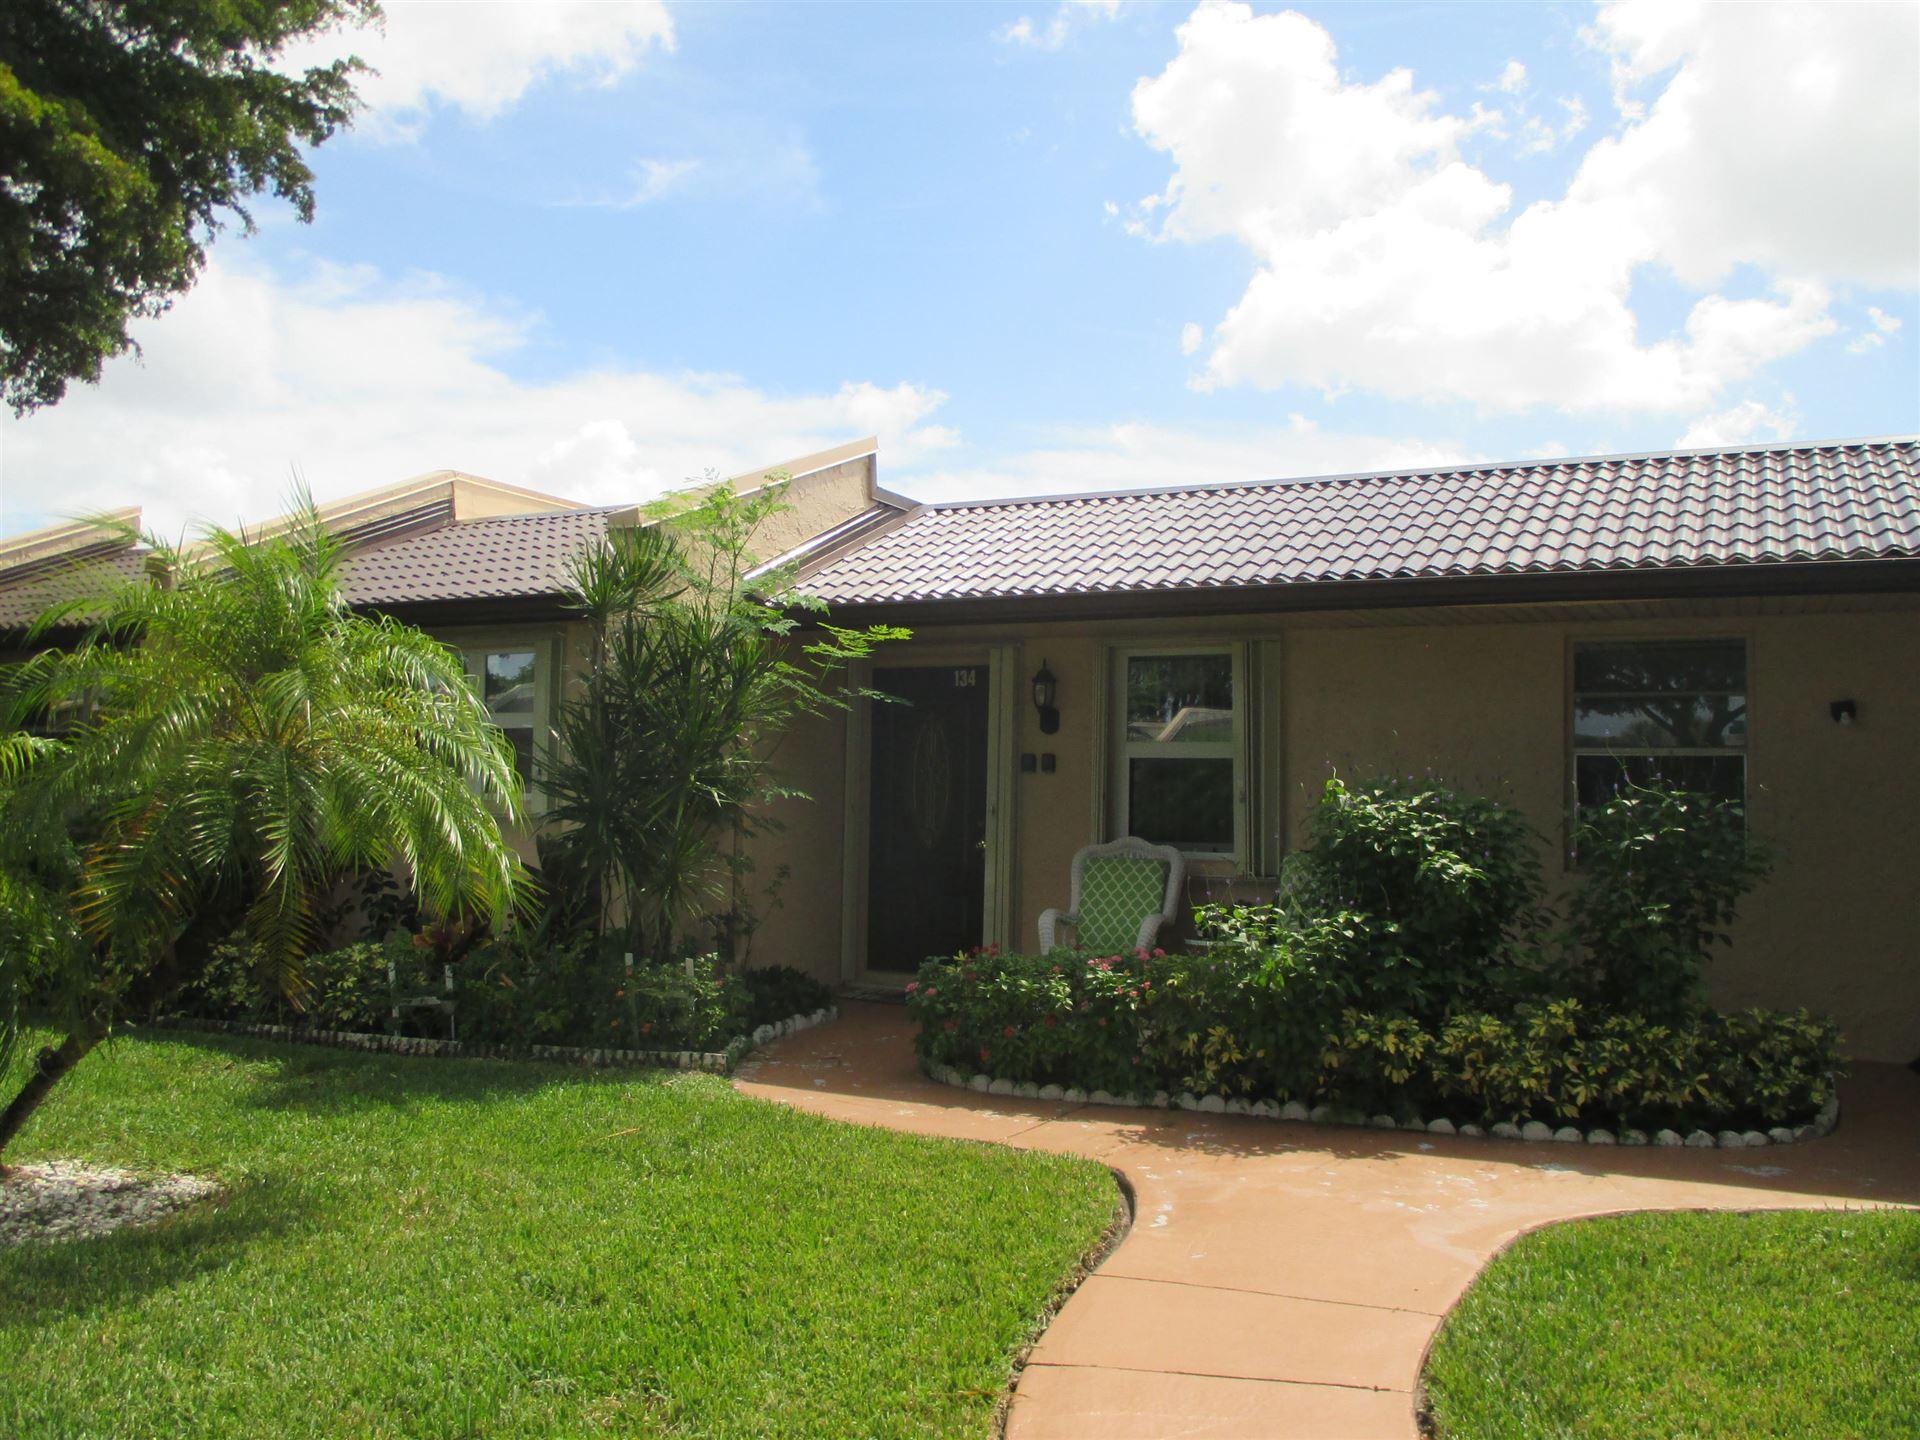 134 Lake Gloria Drive, West Palm Beach, FL 33411 - #: RX-10661714